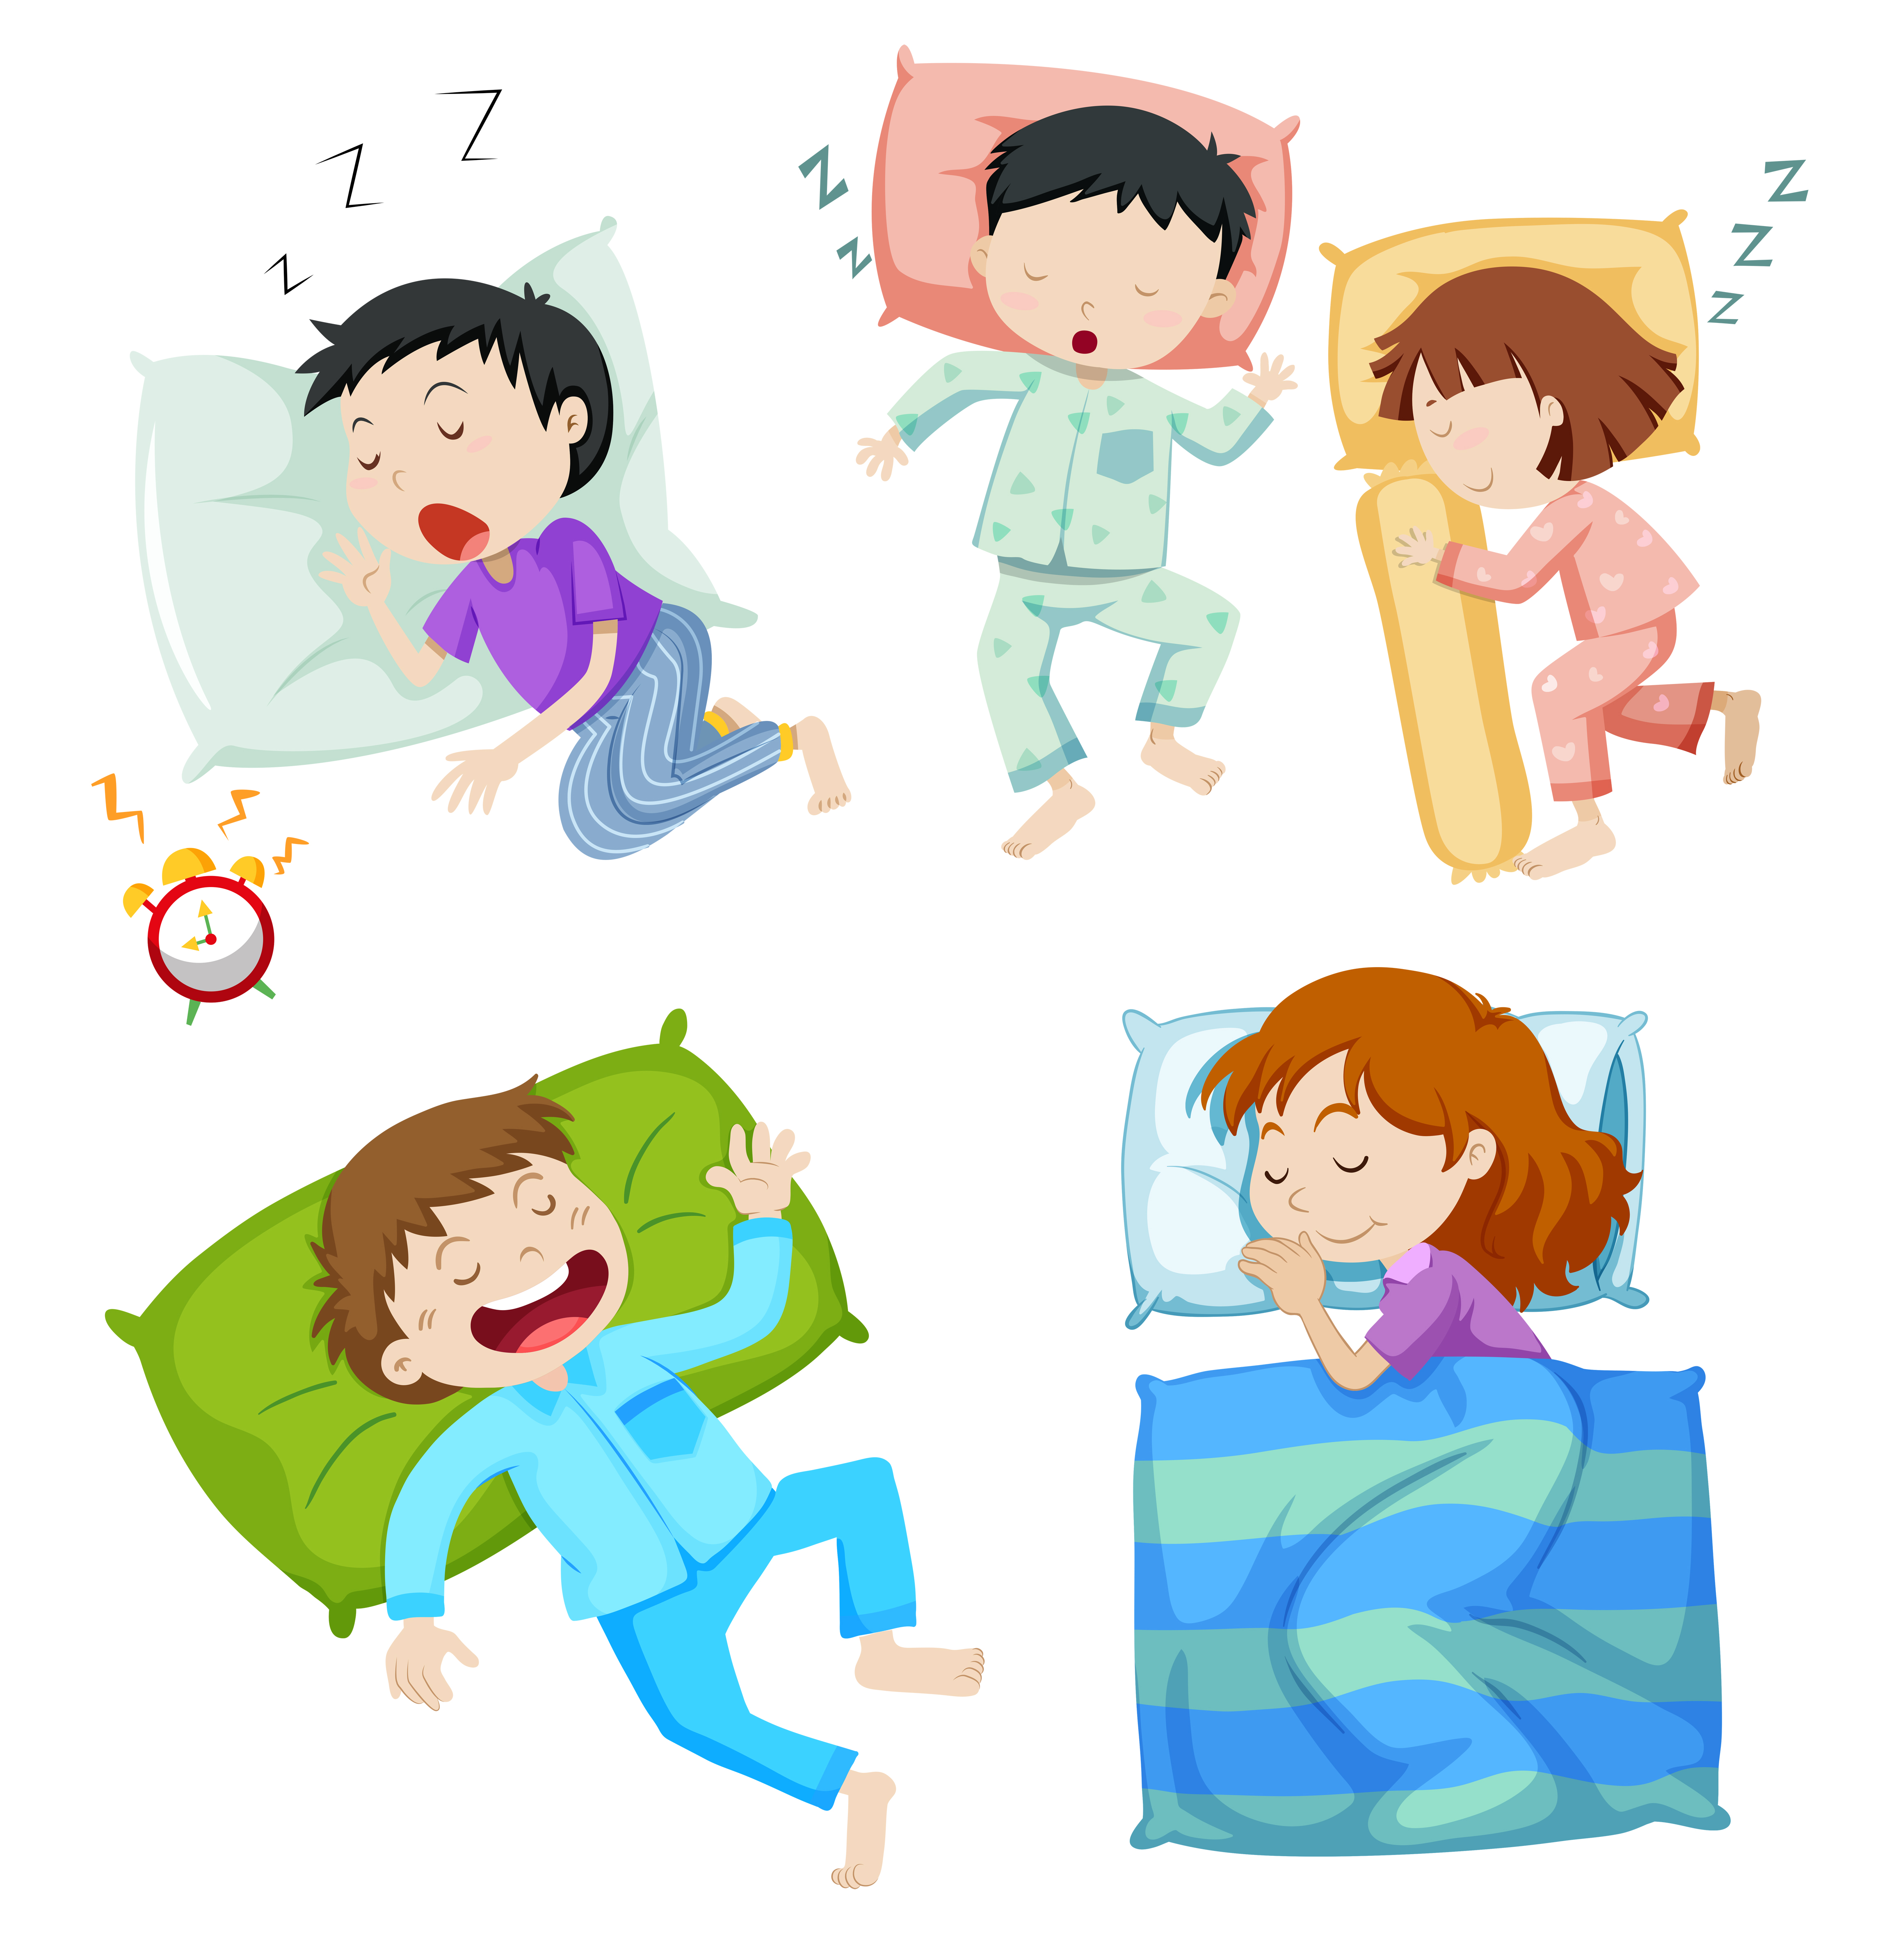 9585a9cb5 Free bed cartoon download free clip art free clip art jpg 4605x4777 Factory clipart  clipartbarn images